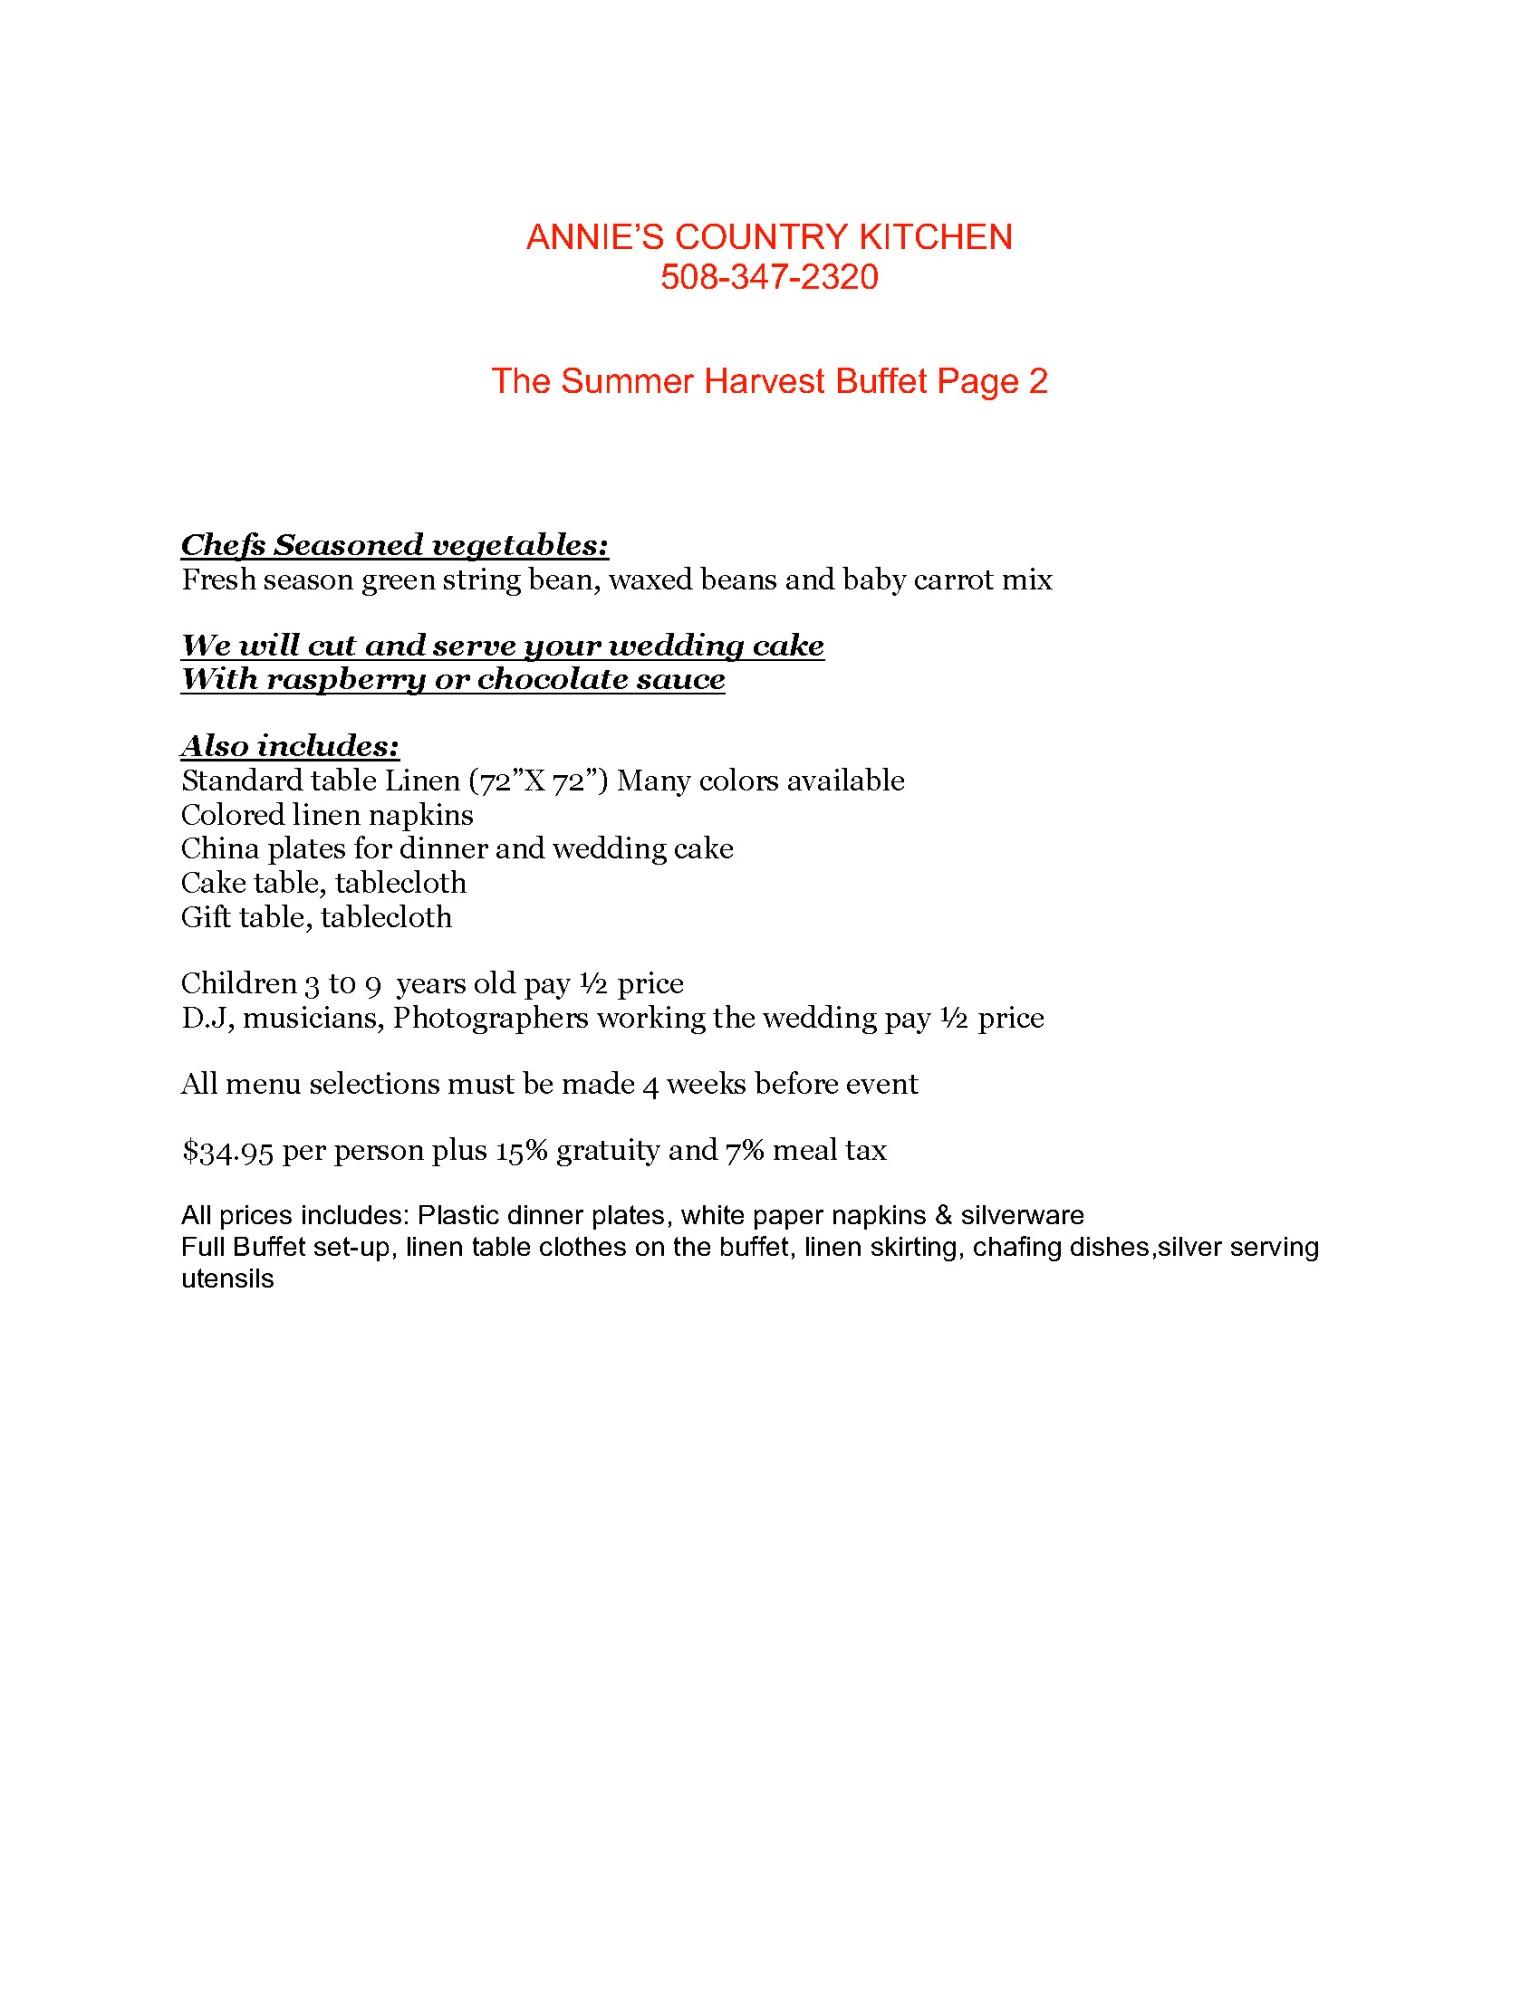 summerharvestbuffet_page_2